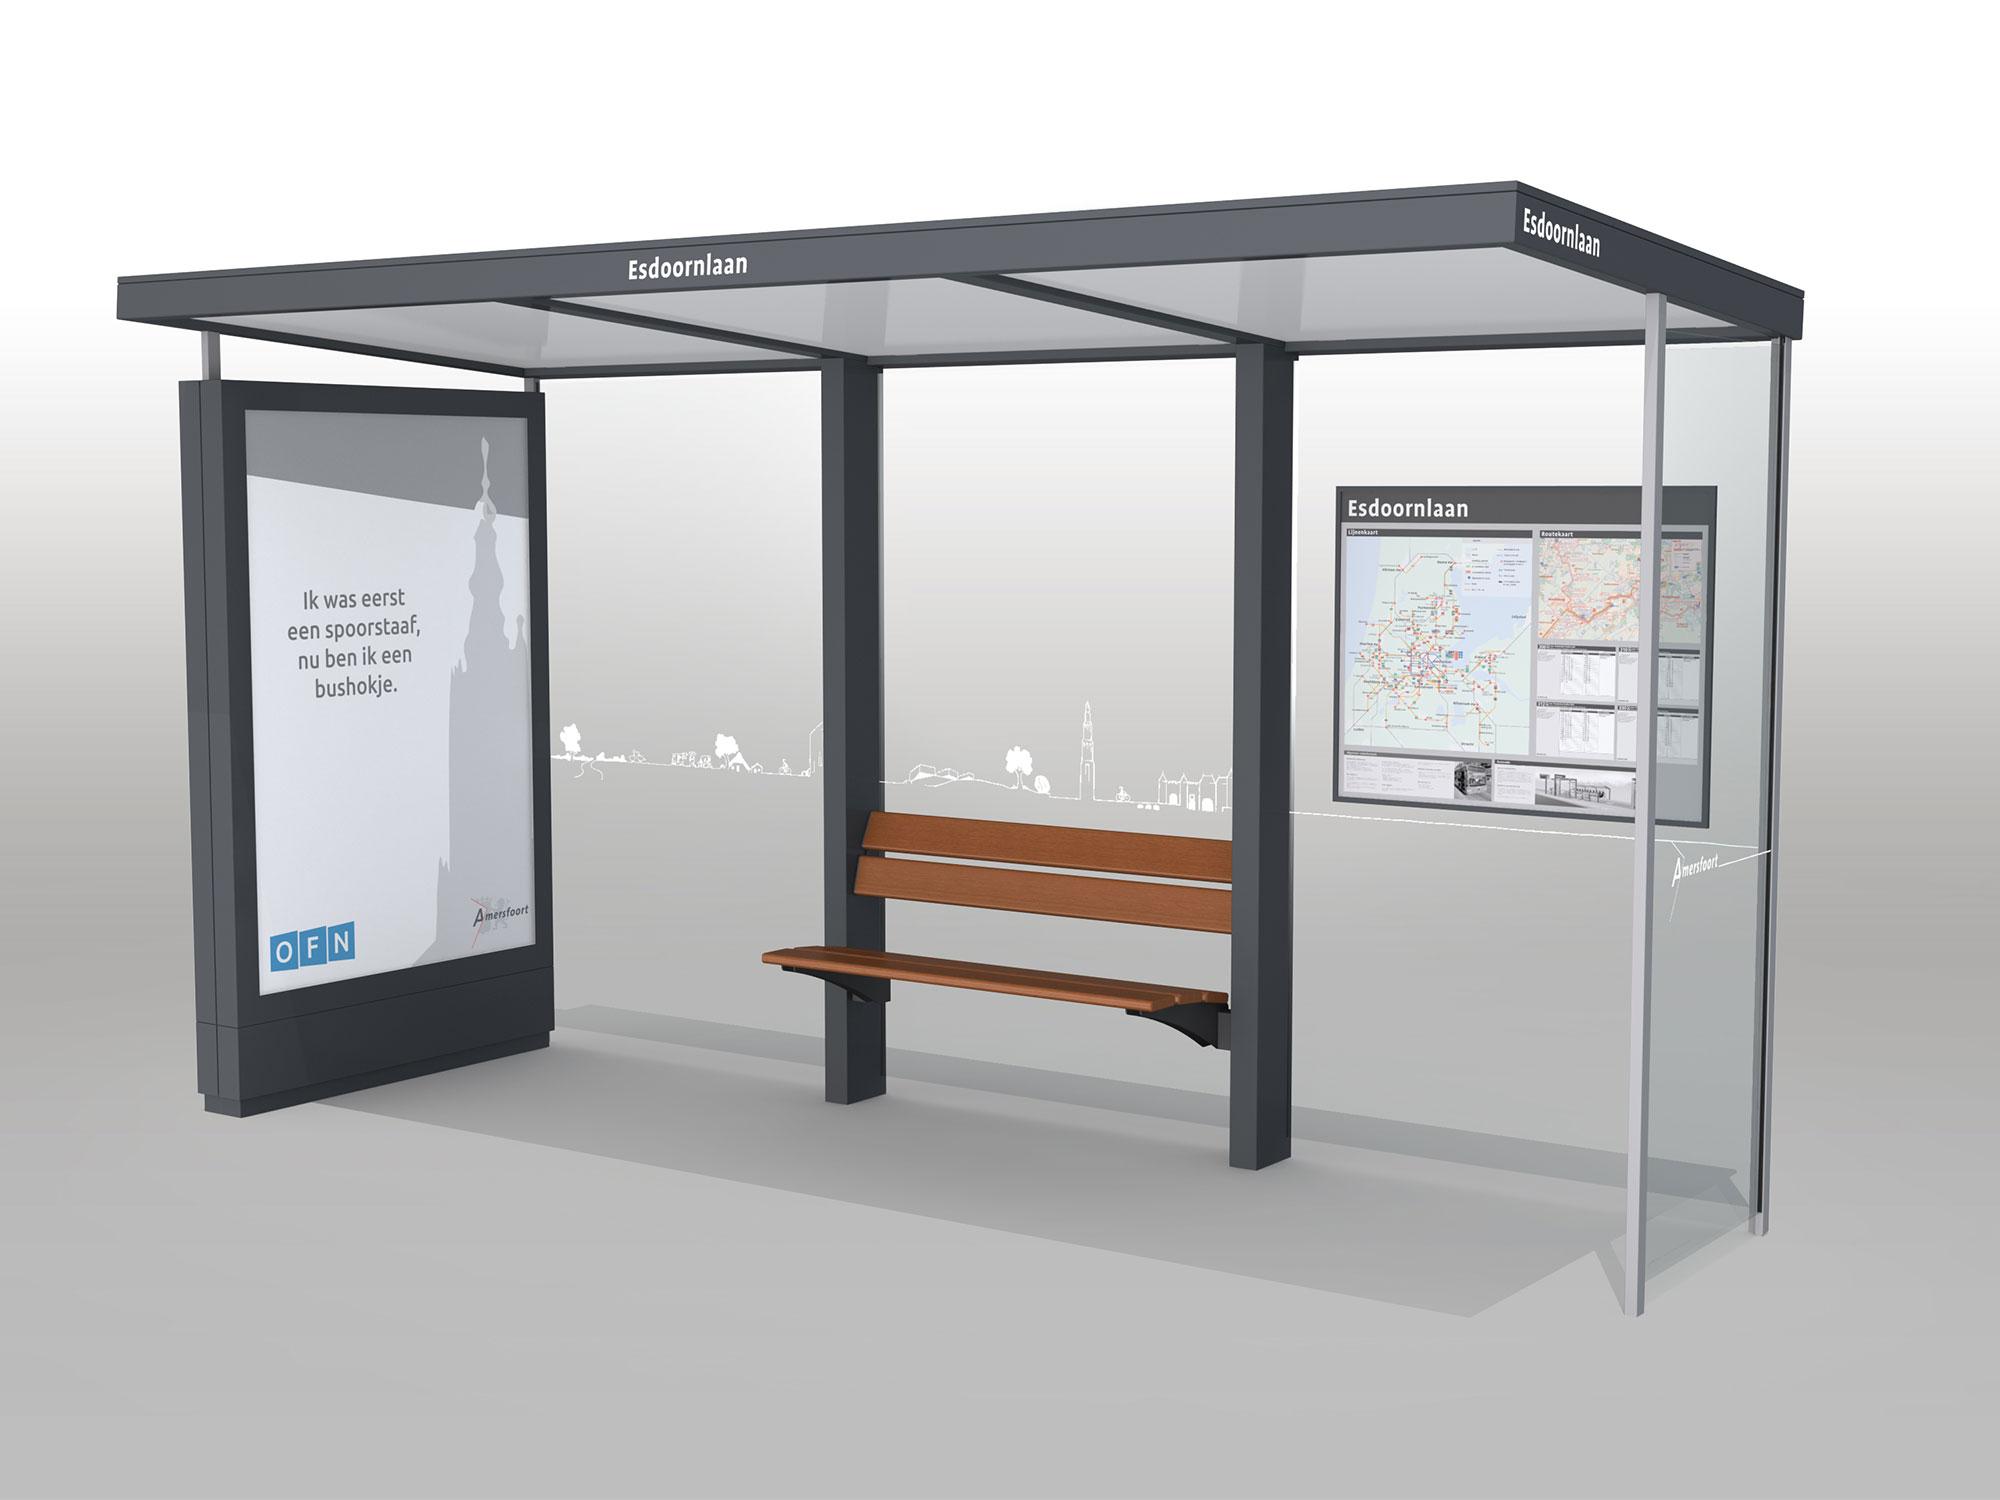 design bushokjes gemeente Amersfoort